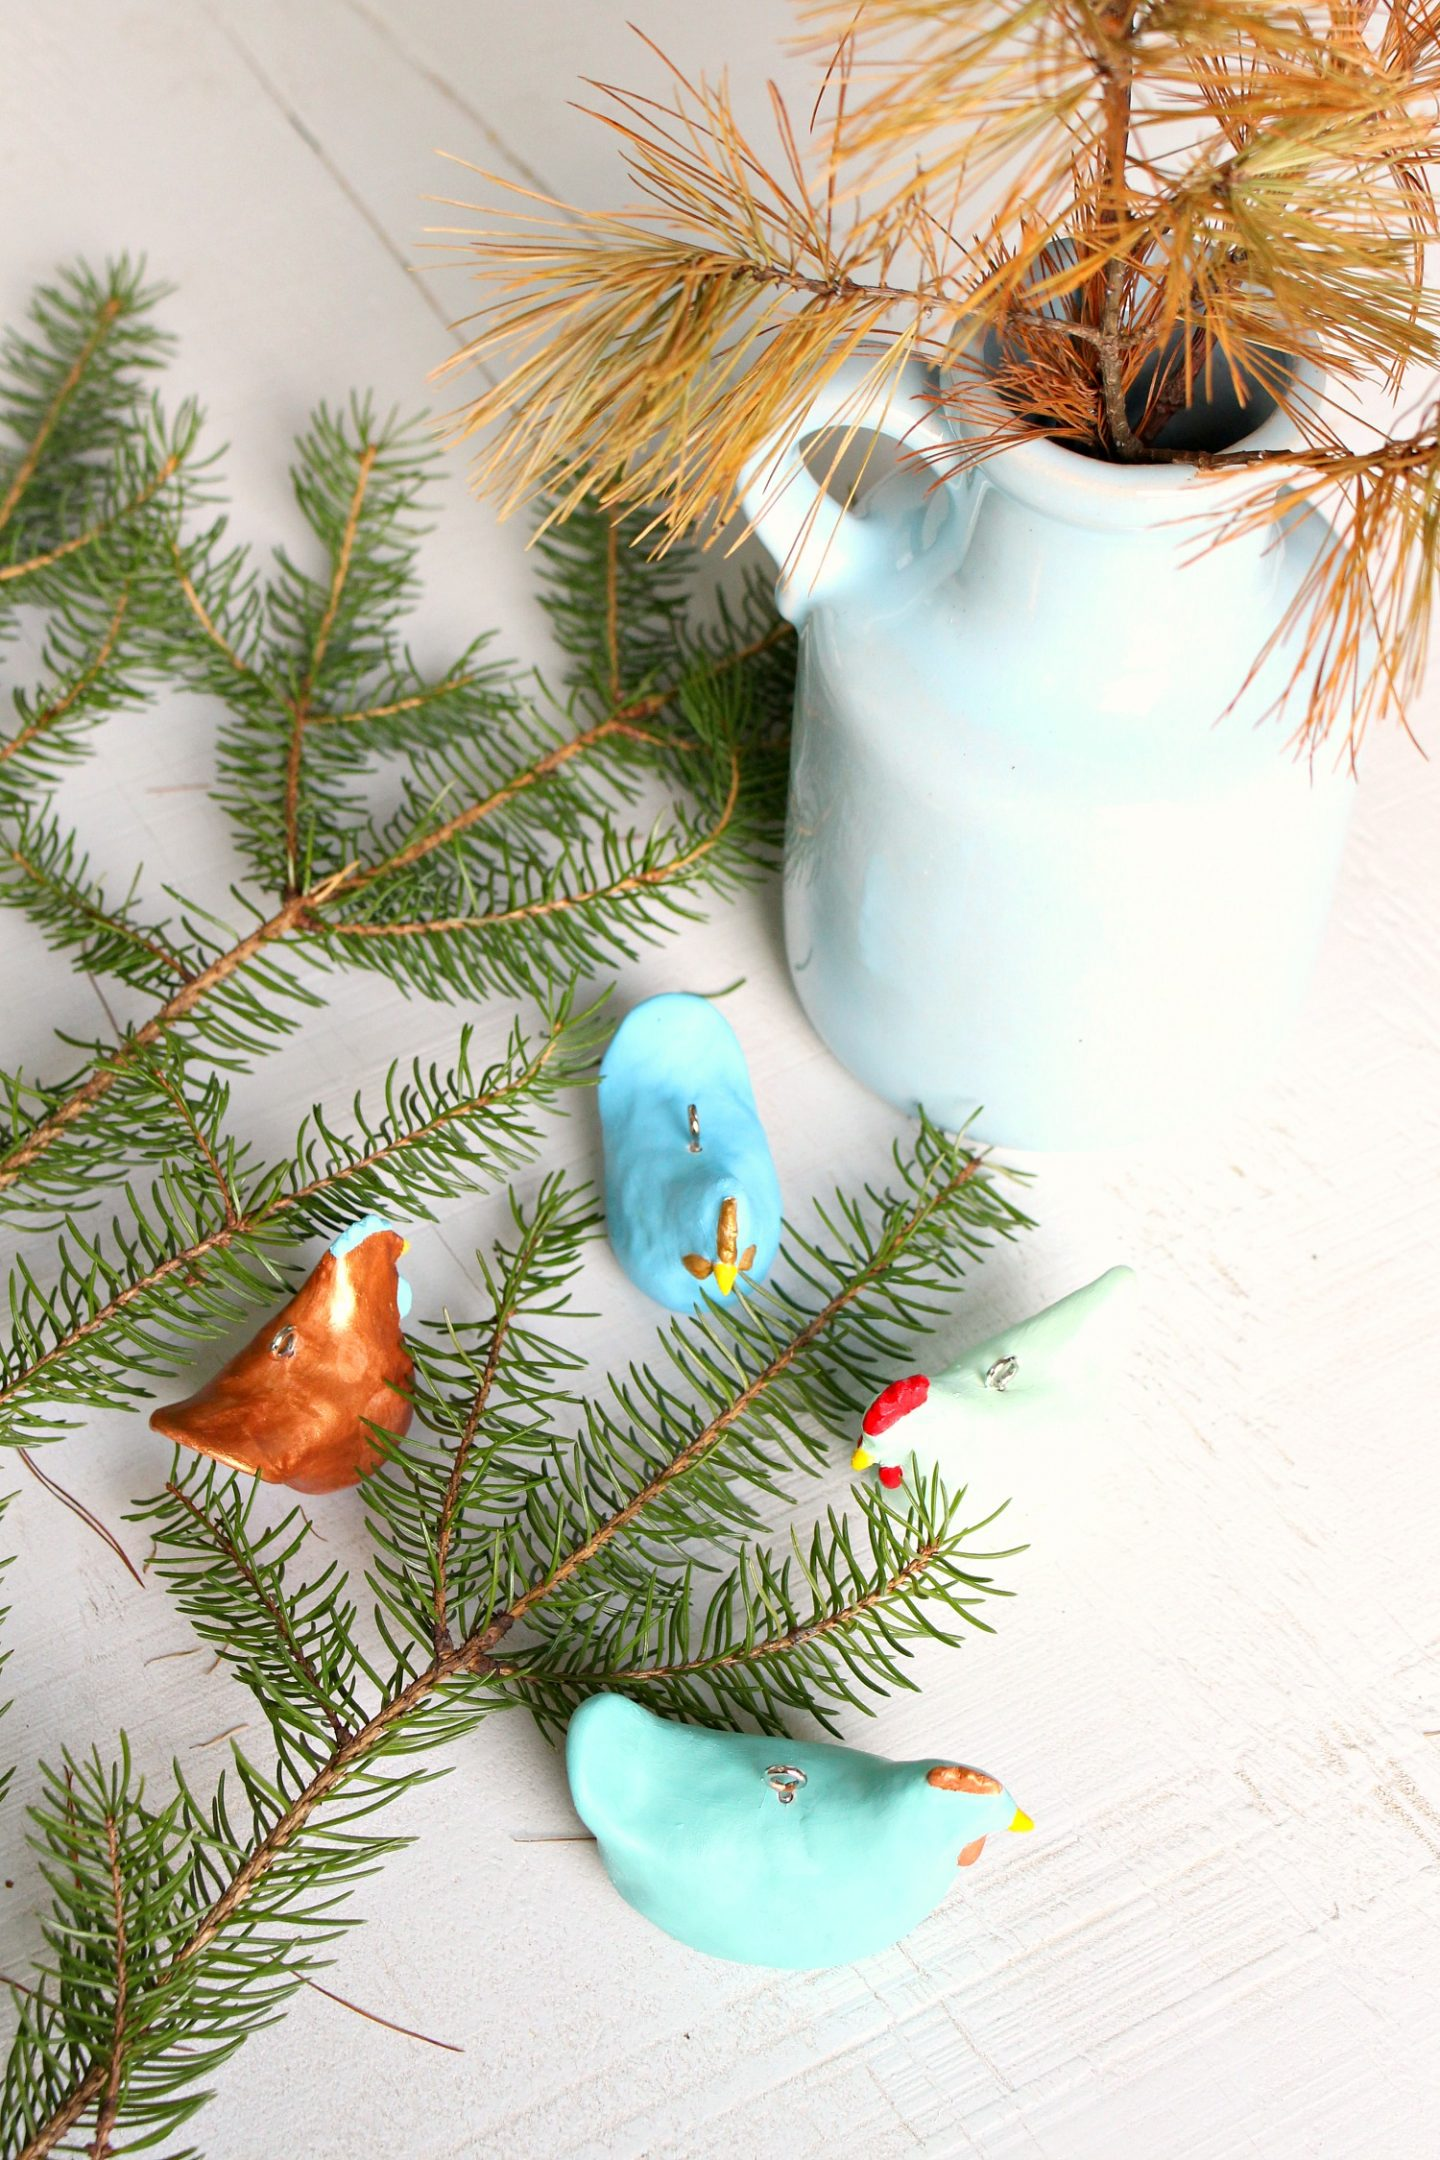 Colorful Chicken Ornaments